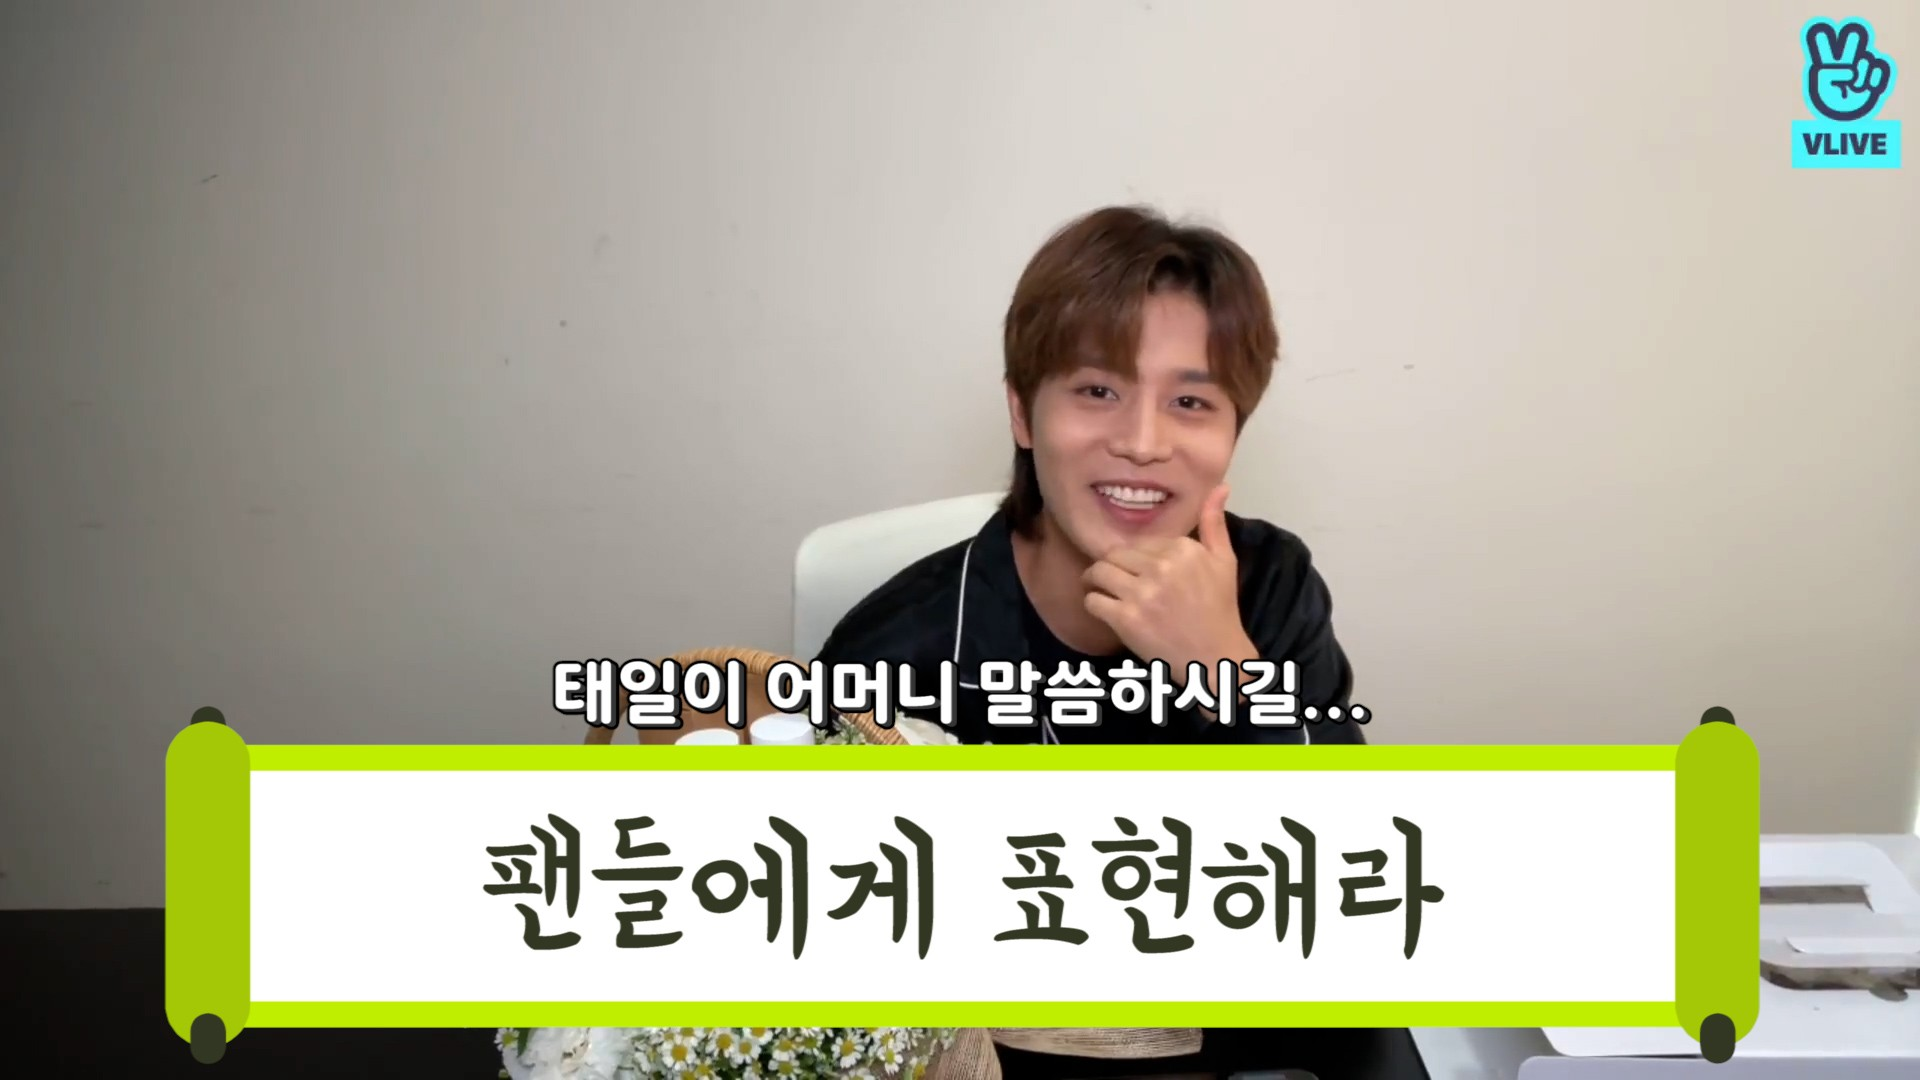 [NCT] 고맙다고 많이많이 표현해주는 문태일 CUTE라고💚 (HAPPY TAEIL DAY!)